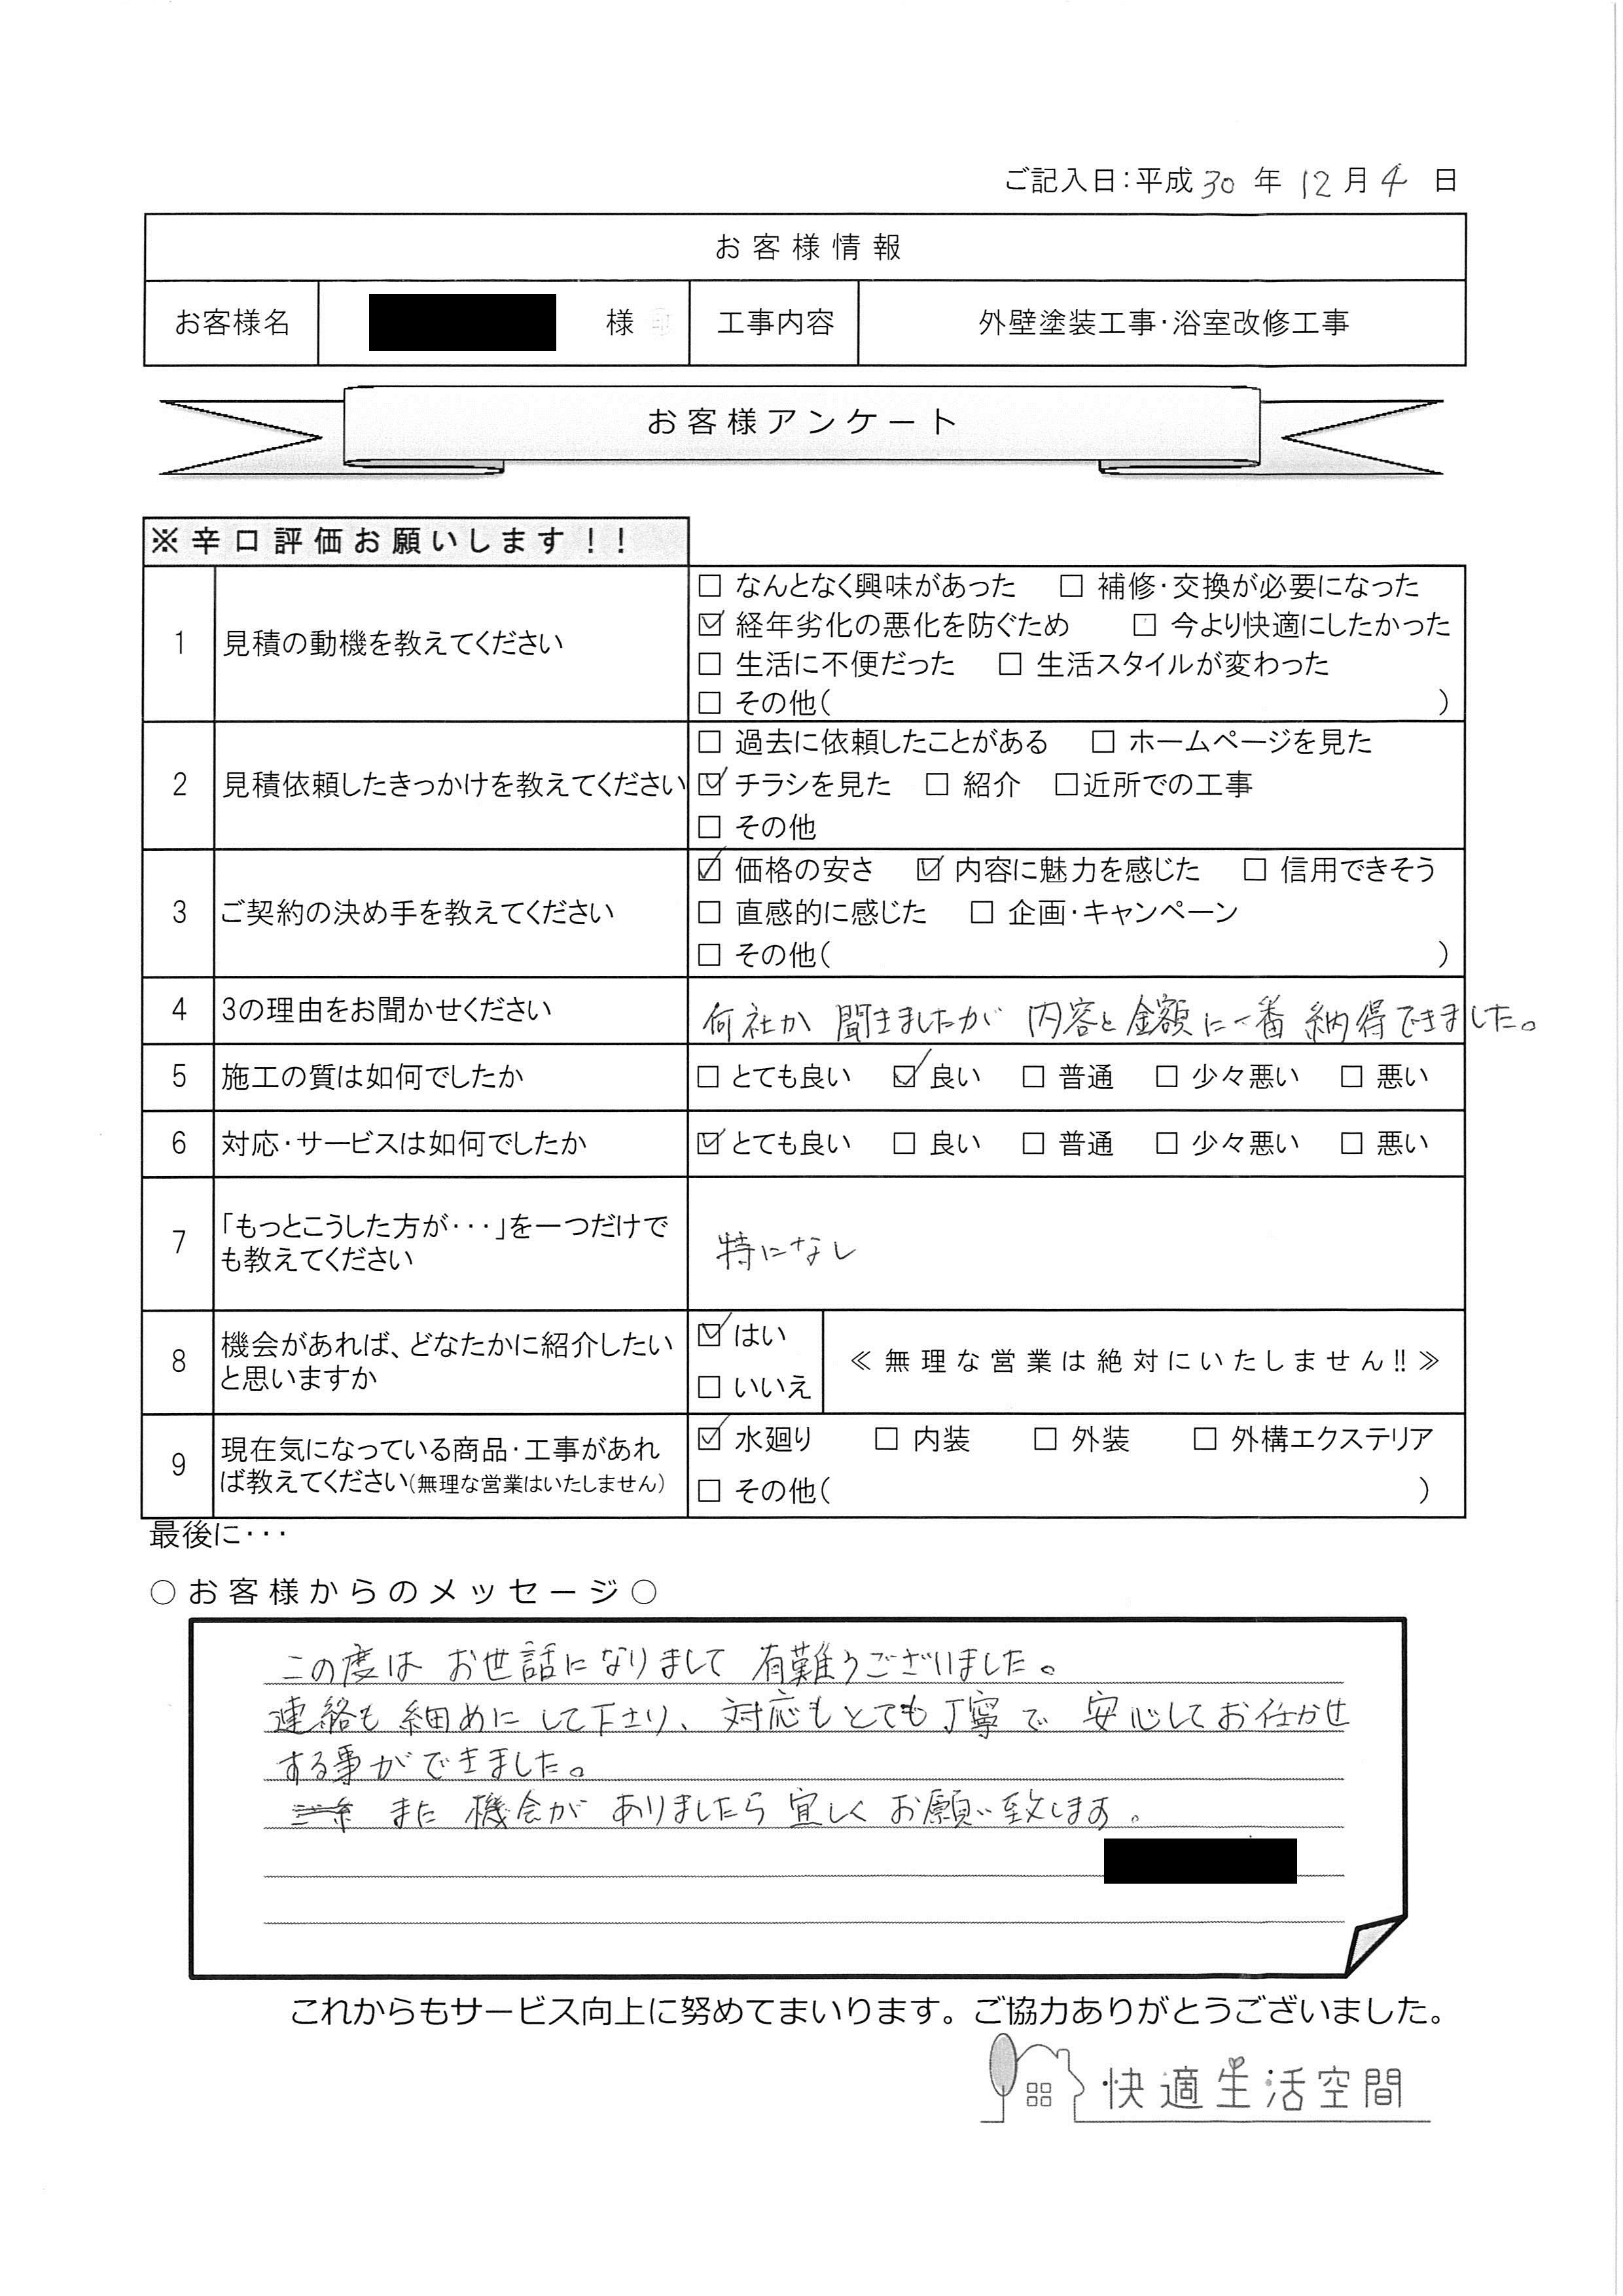 K様邸 外壁塗装_浴室改修工事 アンケート